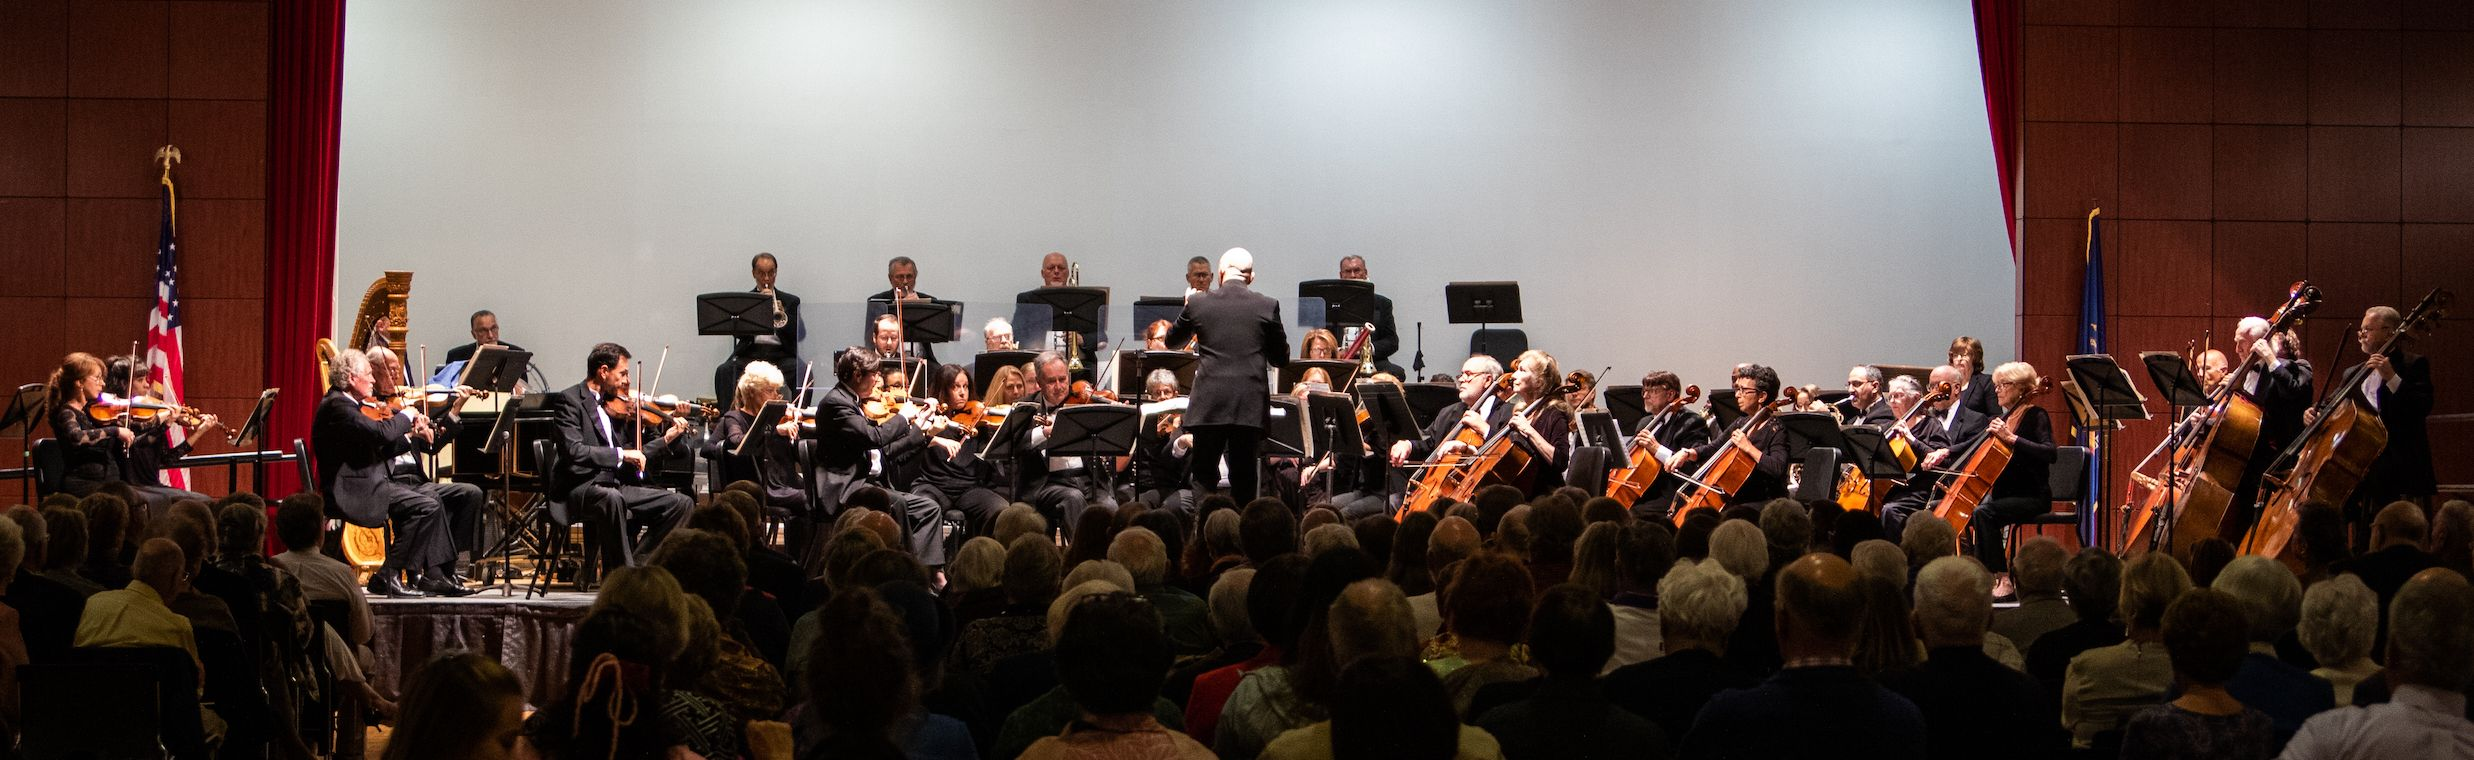 CSO in concert